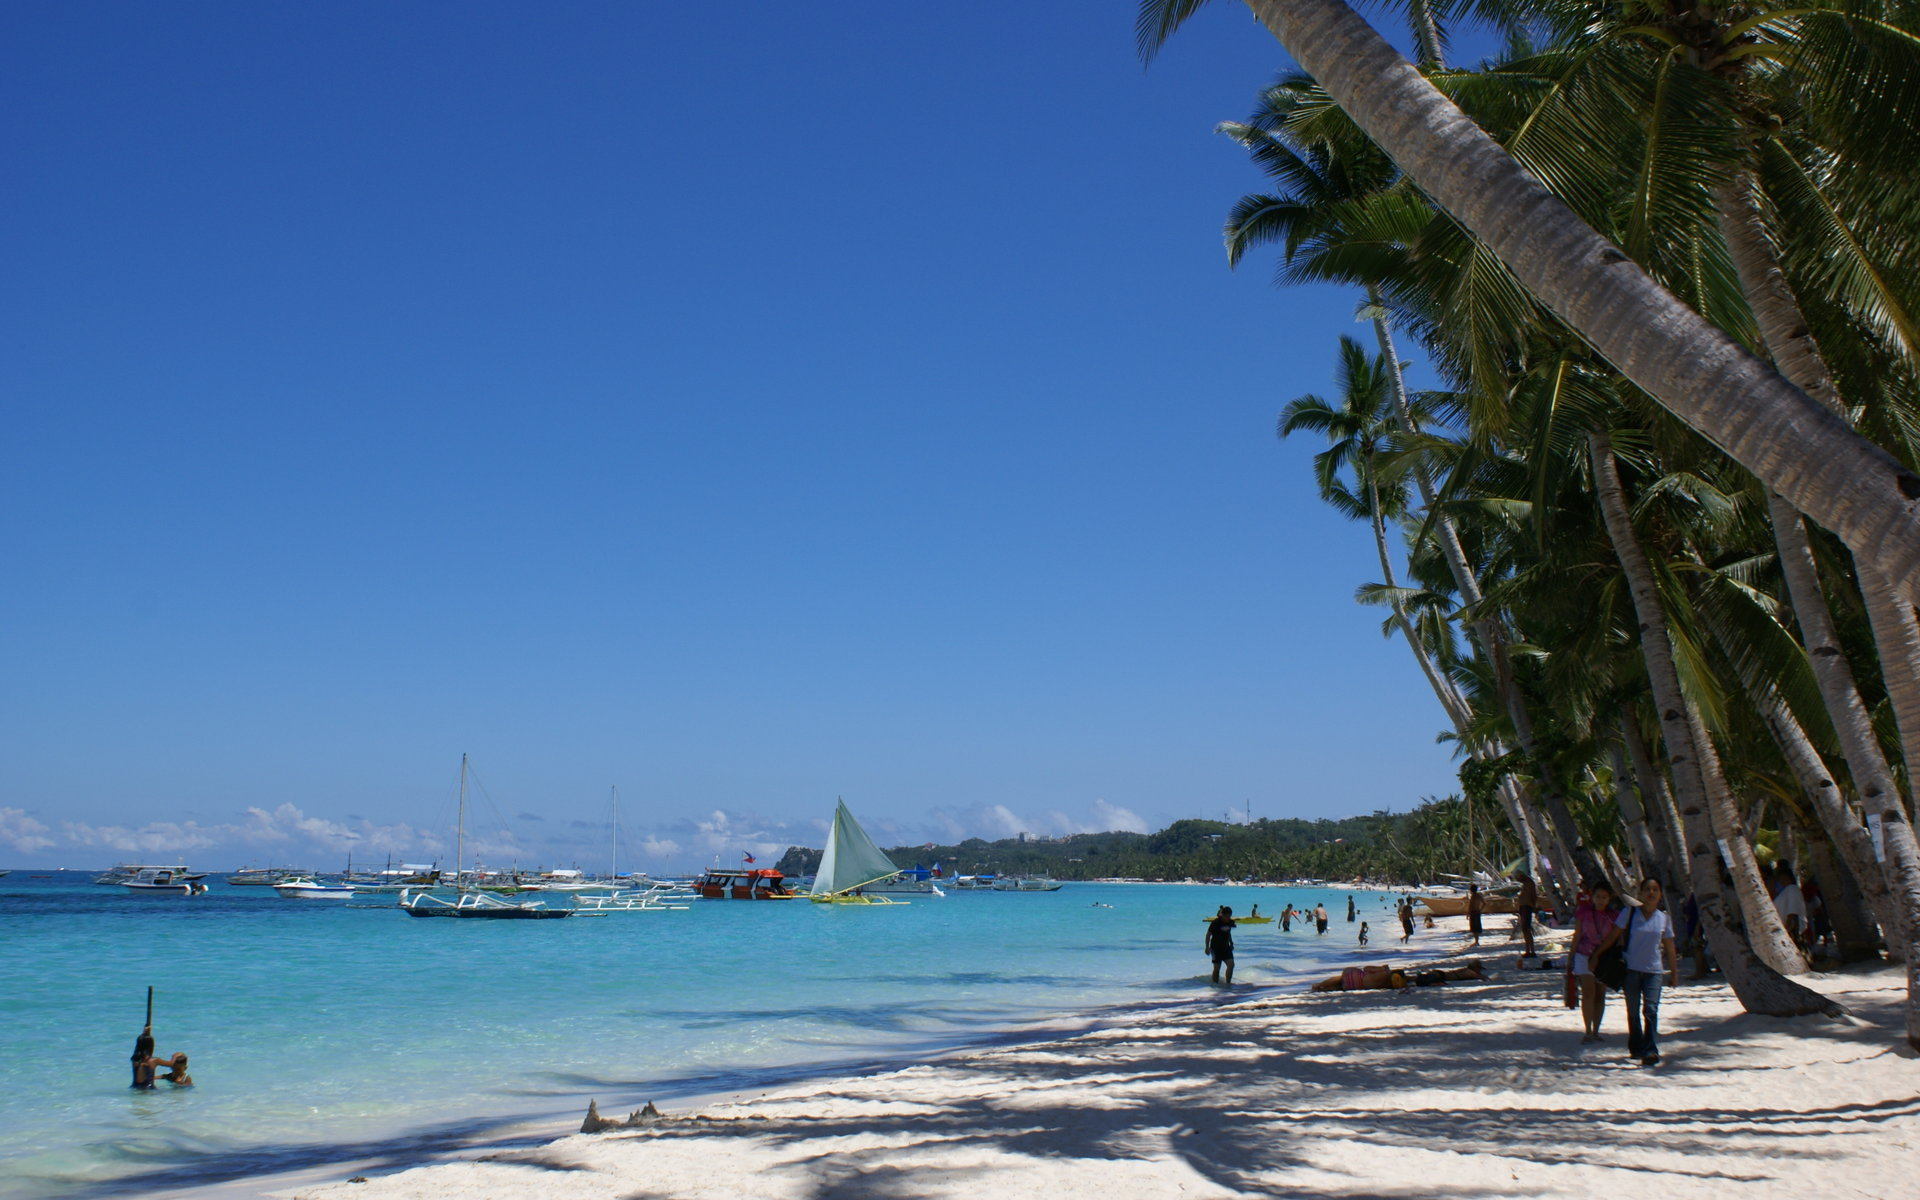 boracay beach hq wide - photo #5